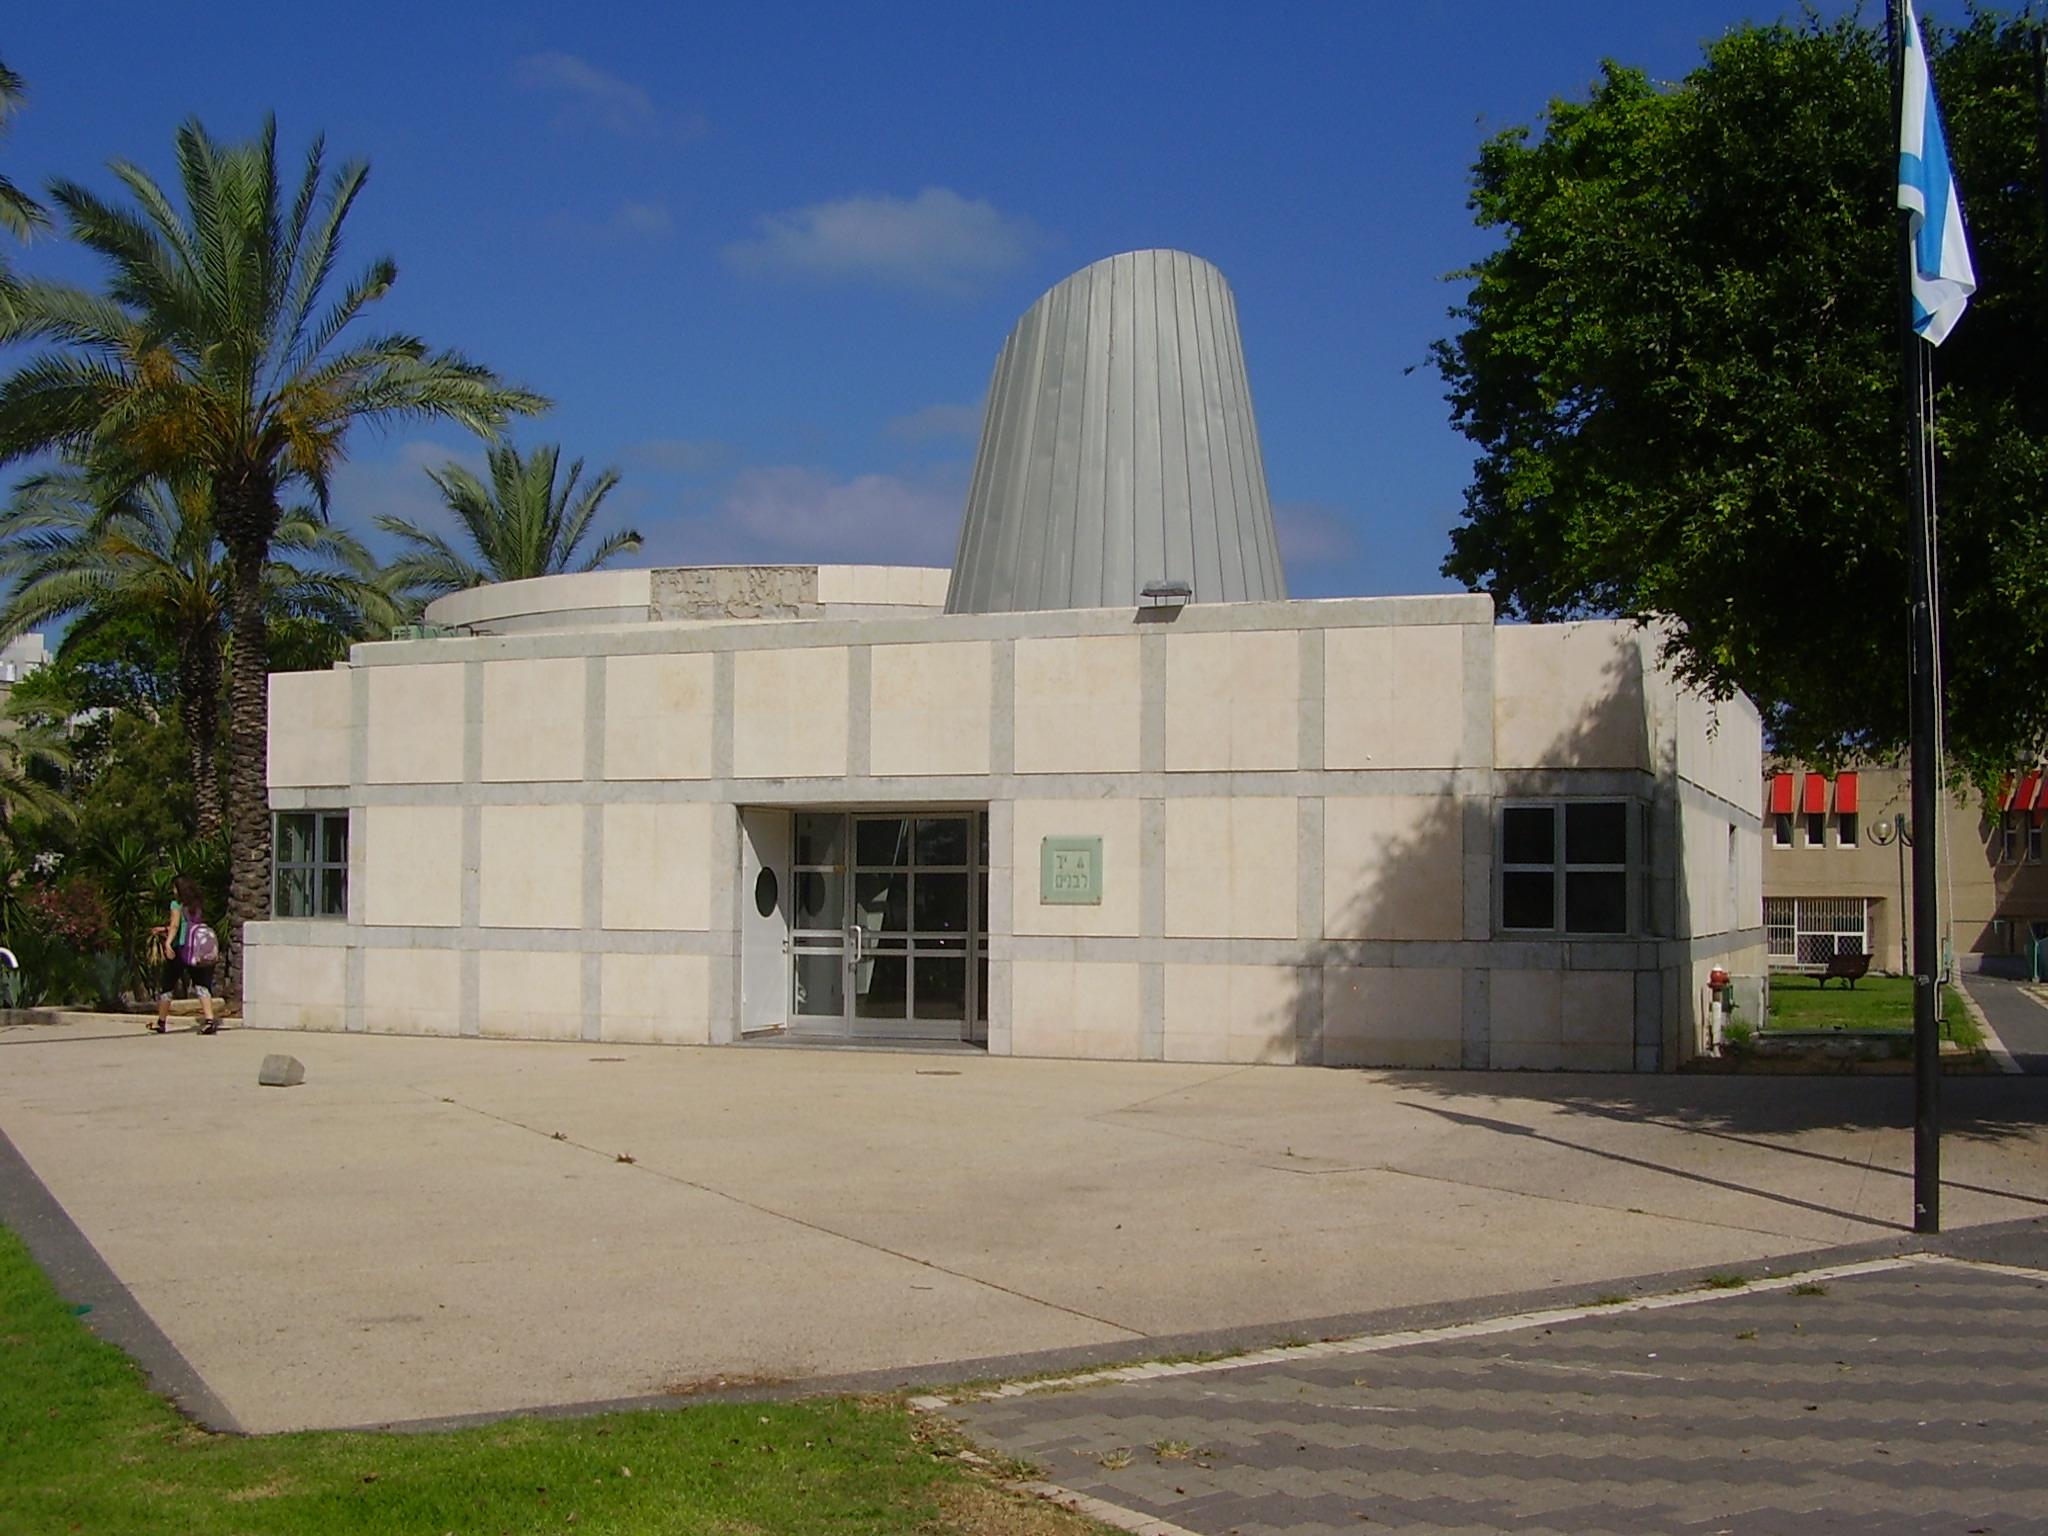 File:PikiWiki Israel 13487 yad labanim kiryat yam.jpg - Wikimedia ...